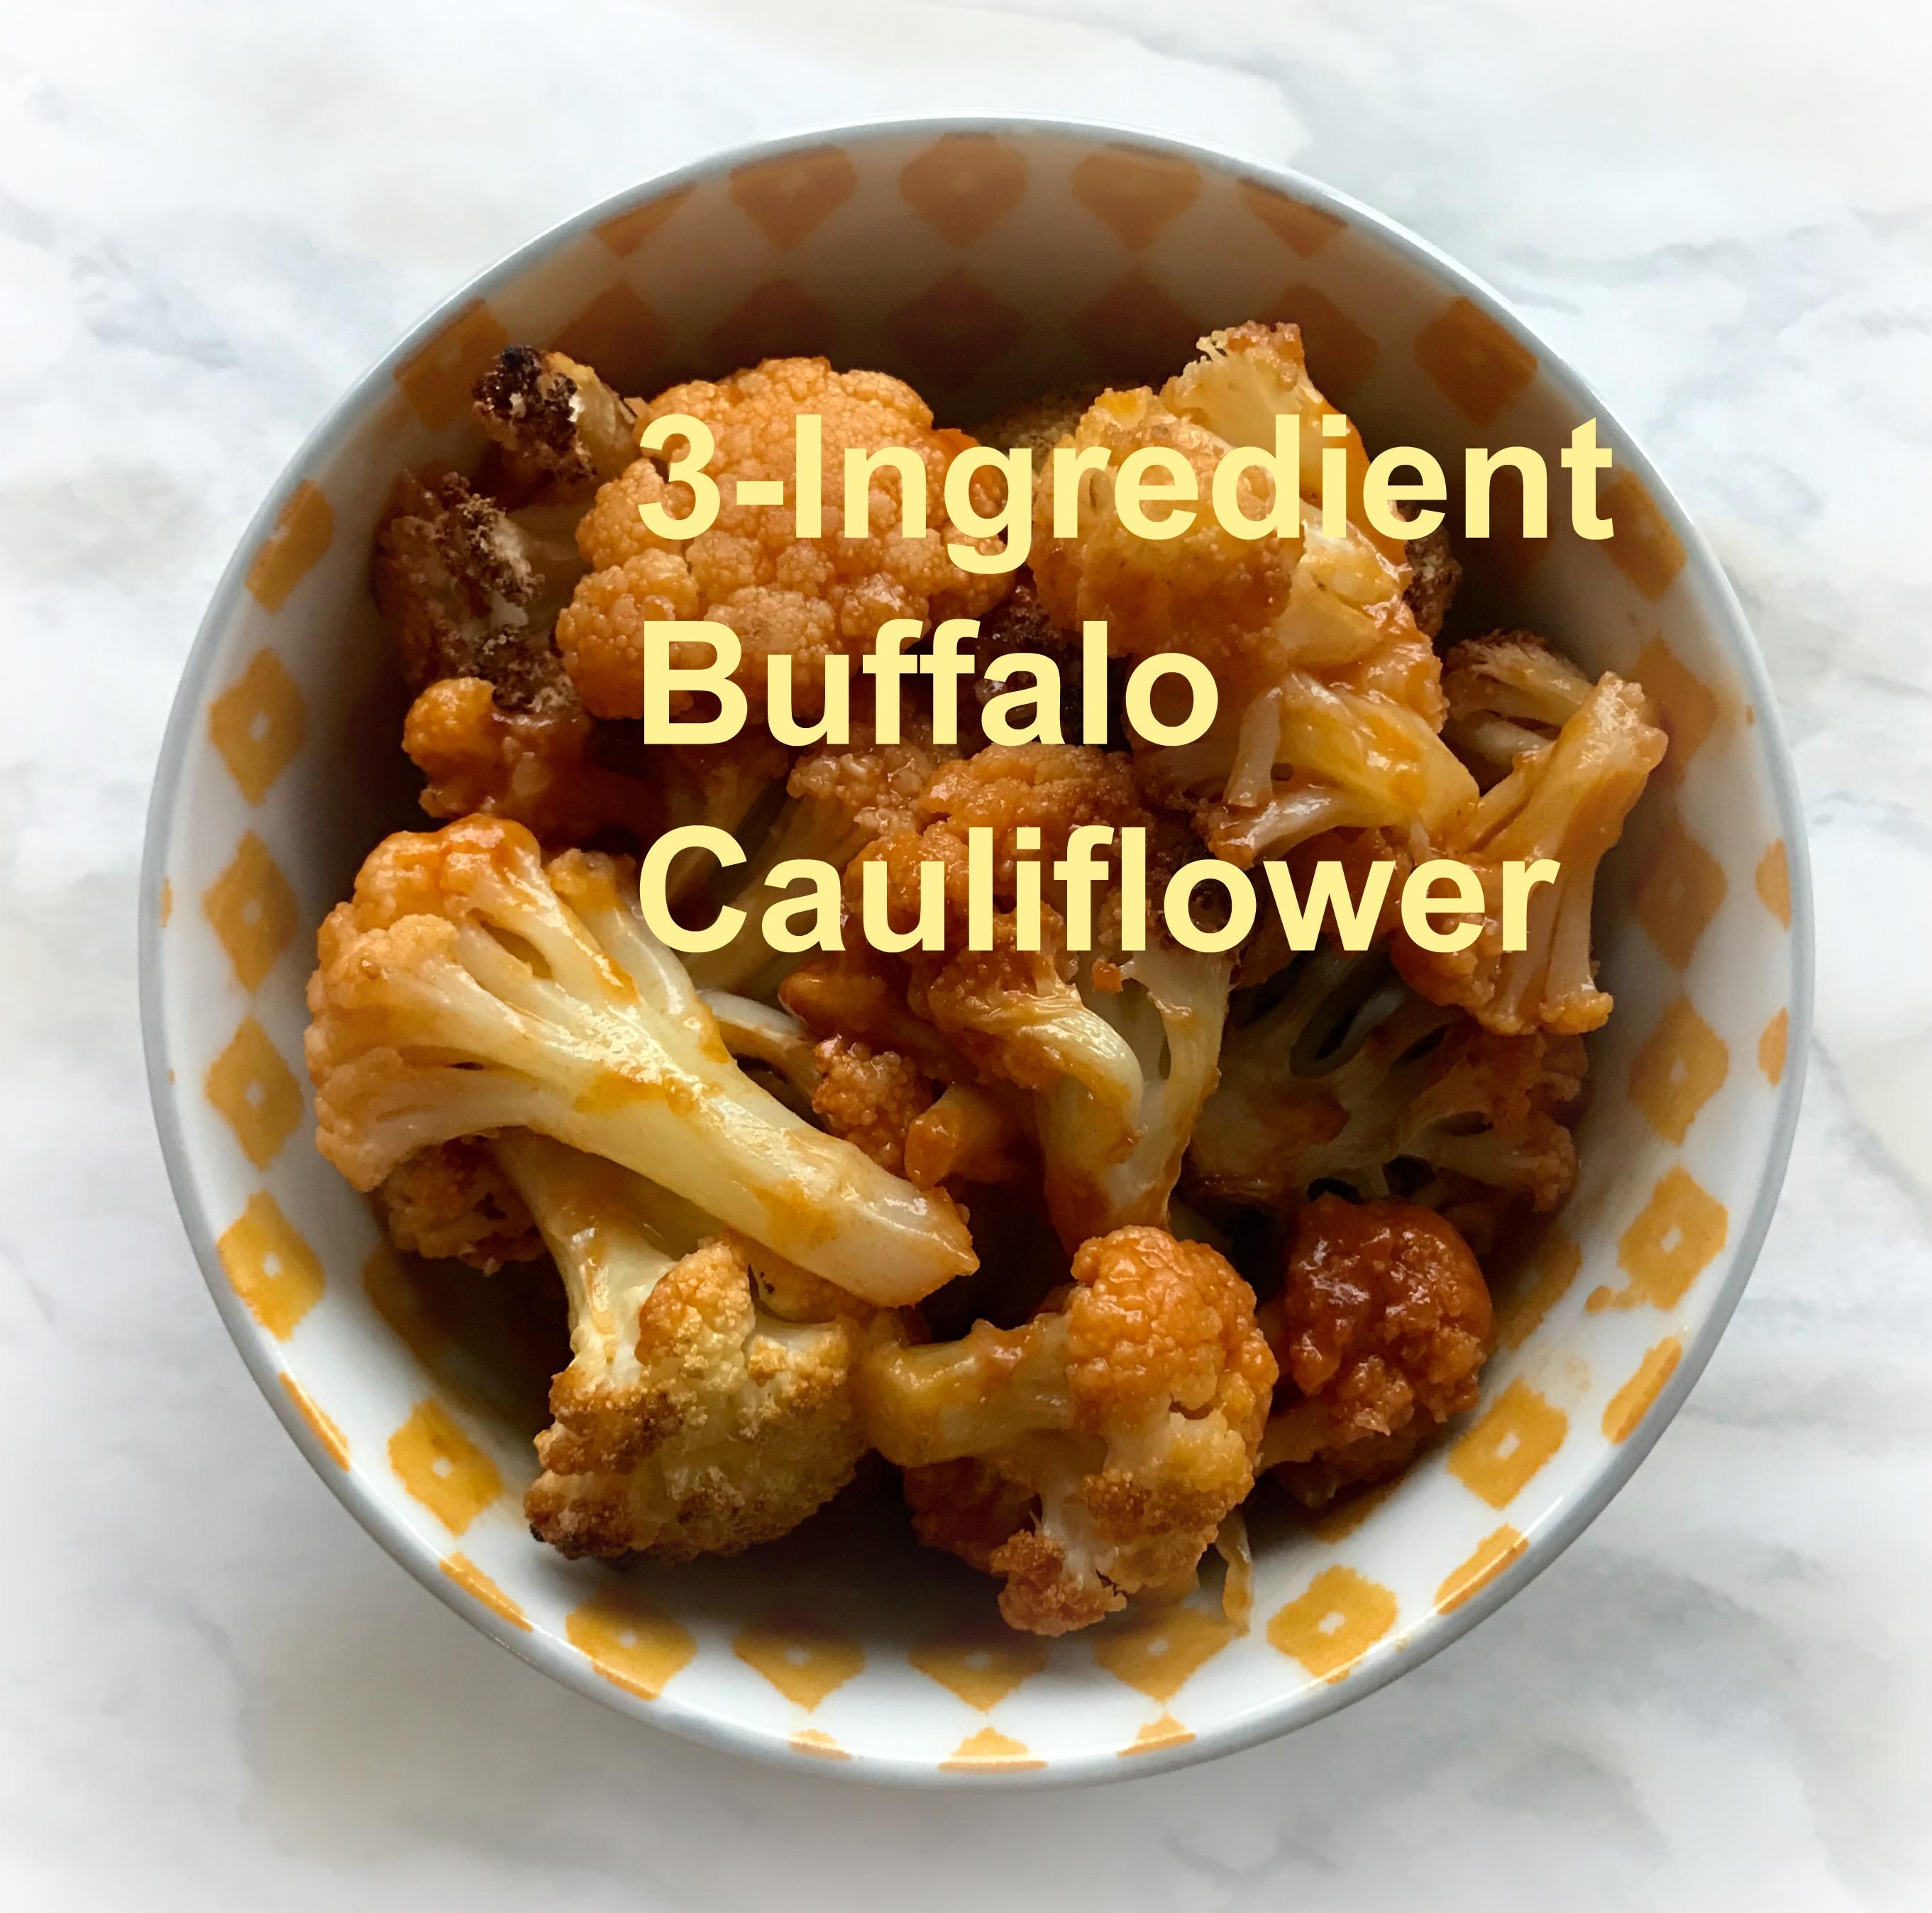 3-Ingredient Buffalo Cauliflower